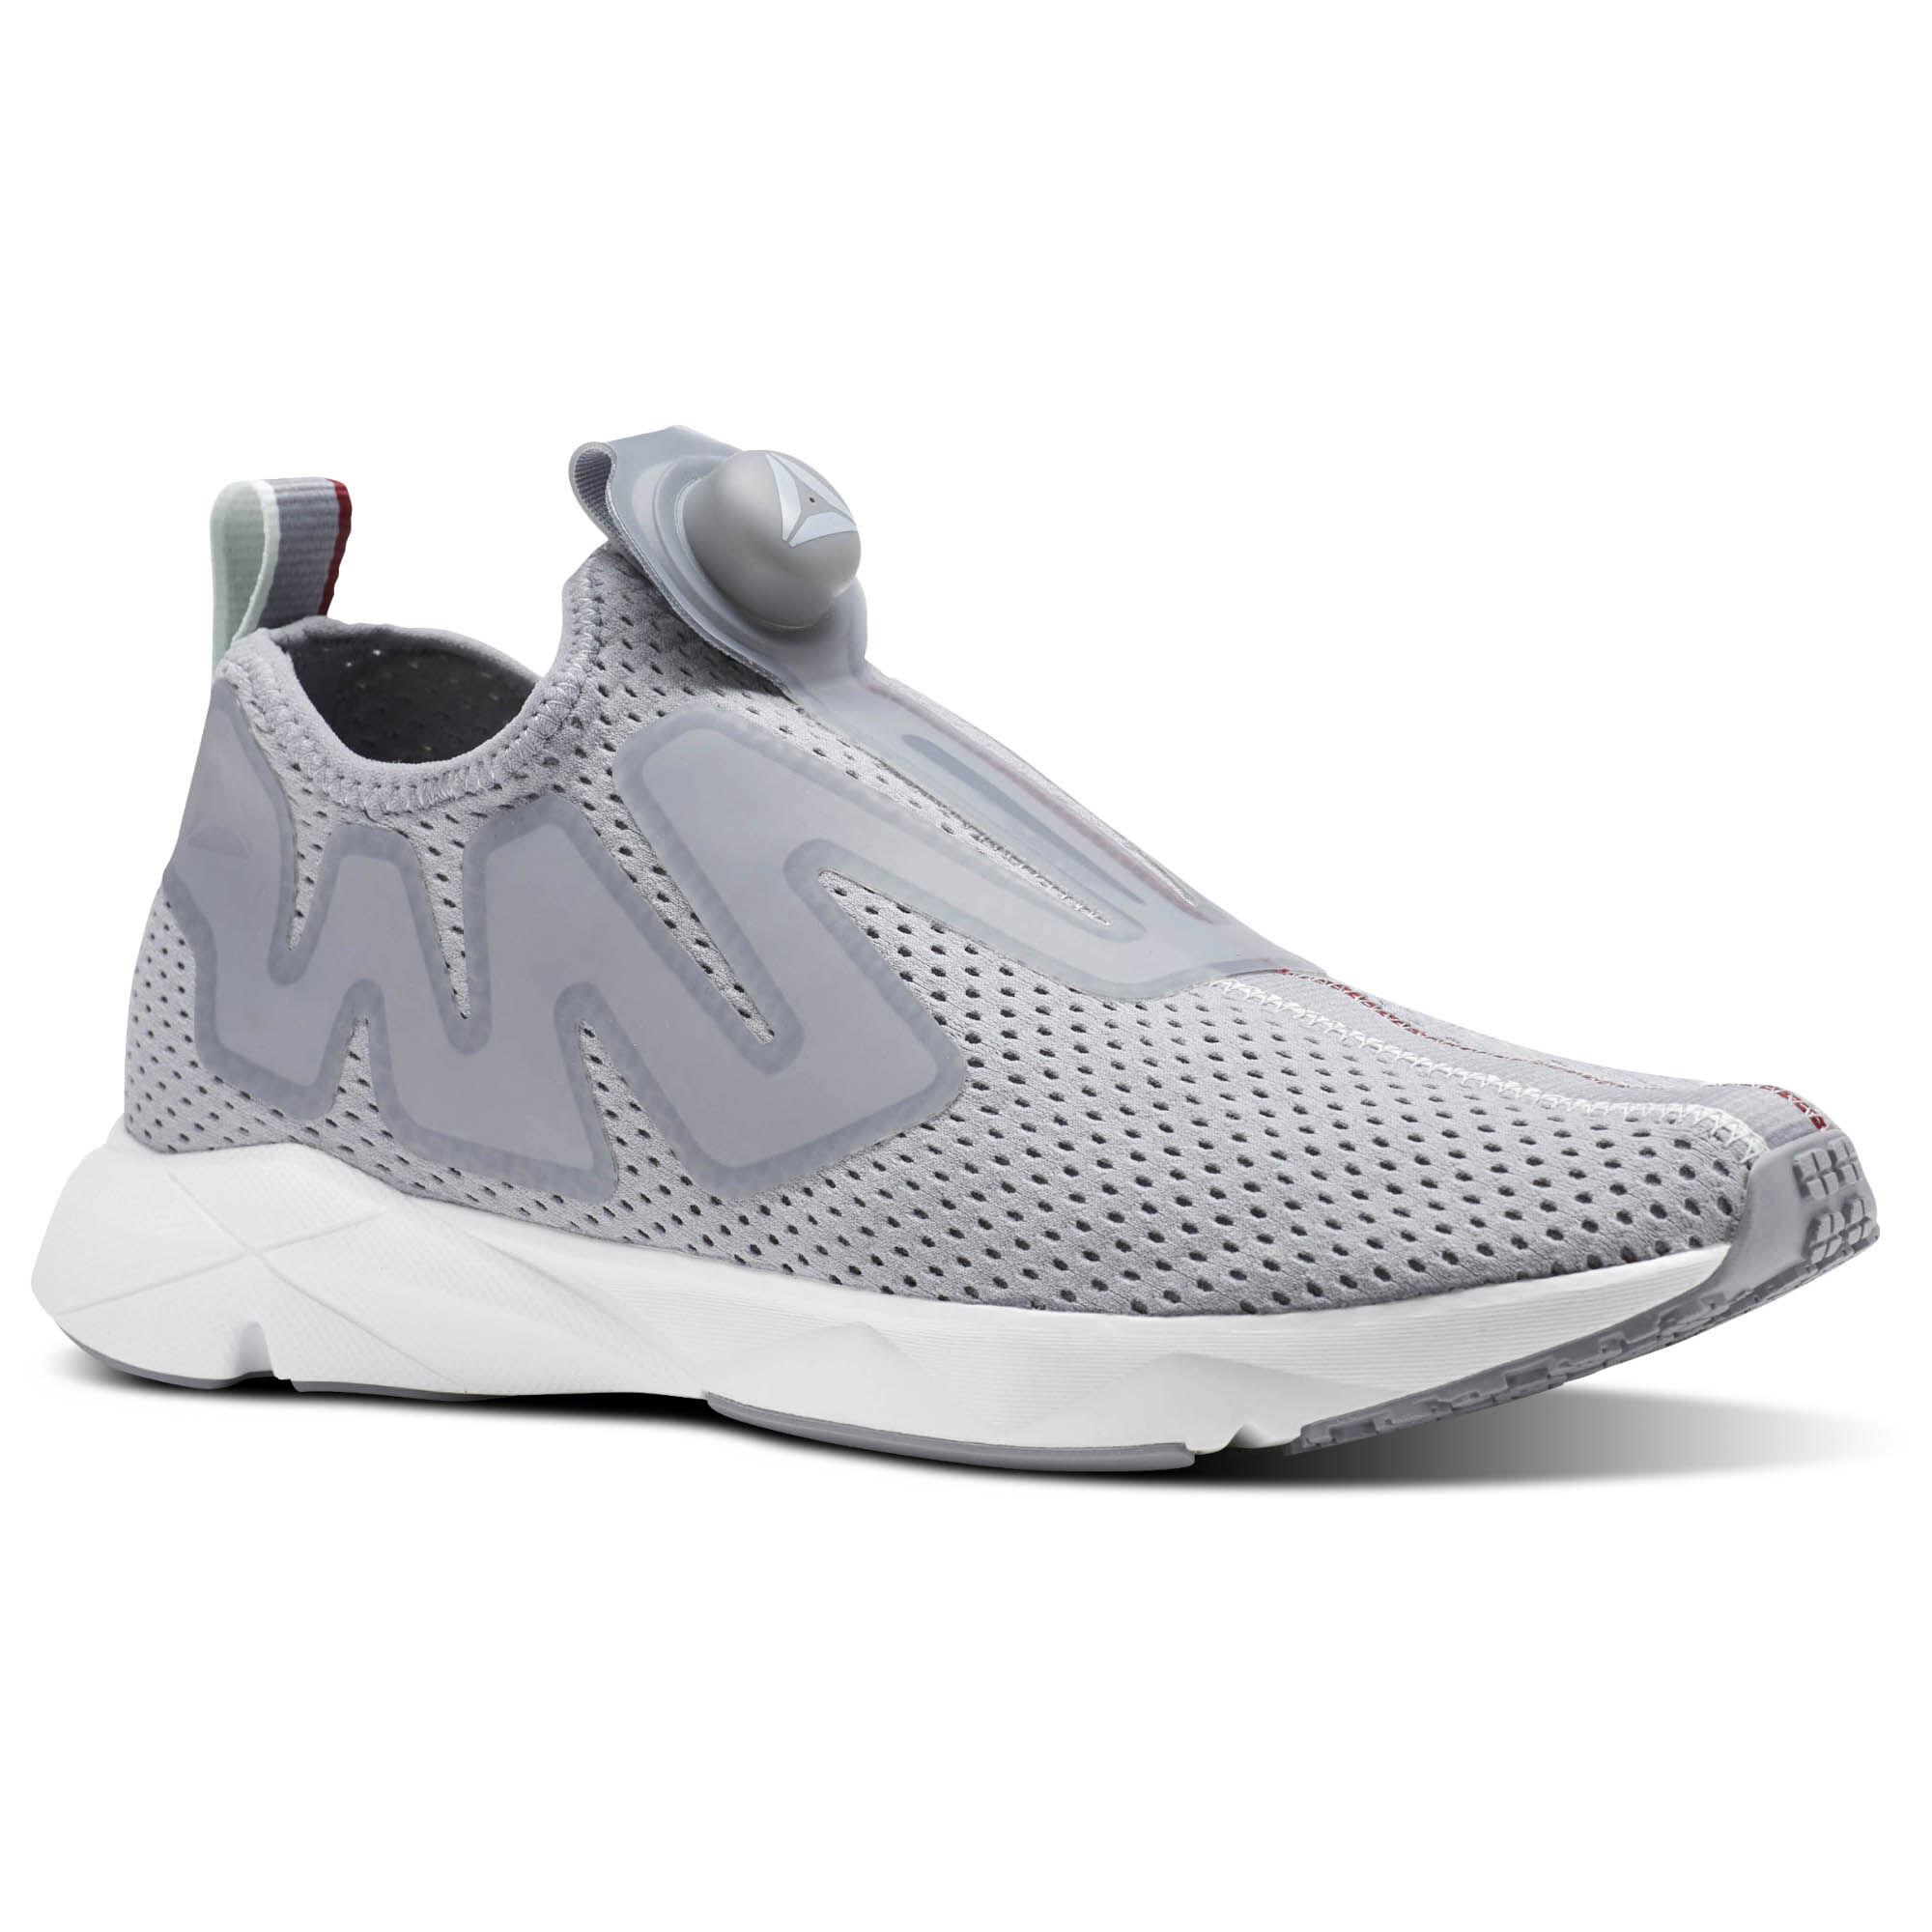 Reebok Running Shoes PUMP SUPREME TAPE For Men White CN1178